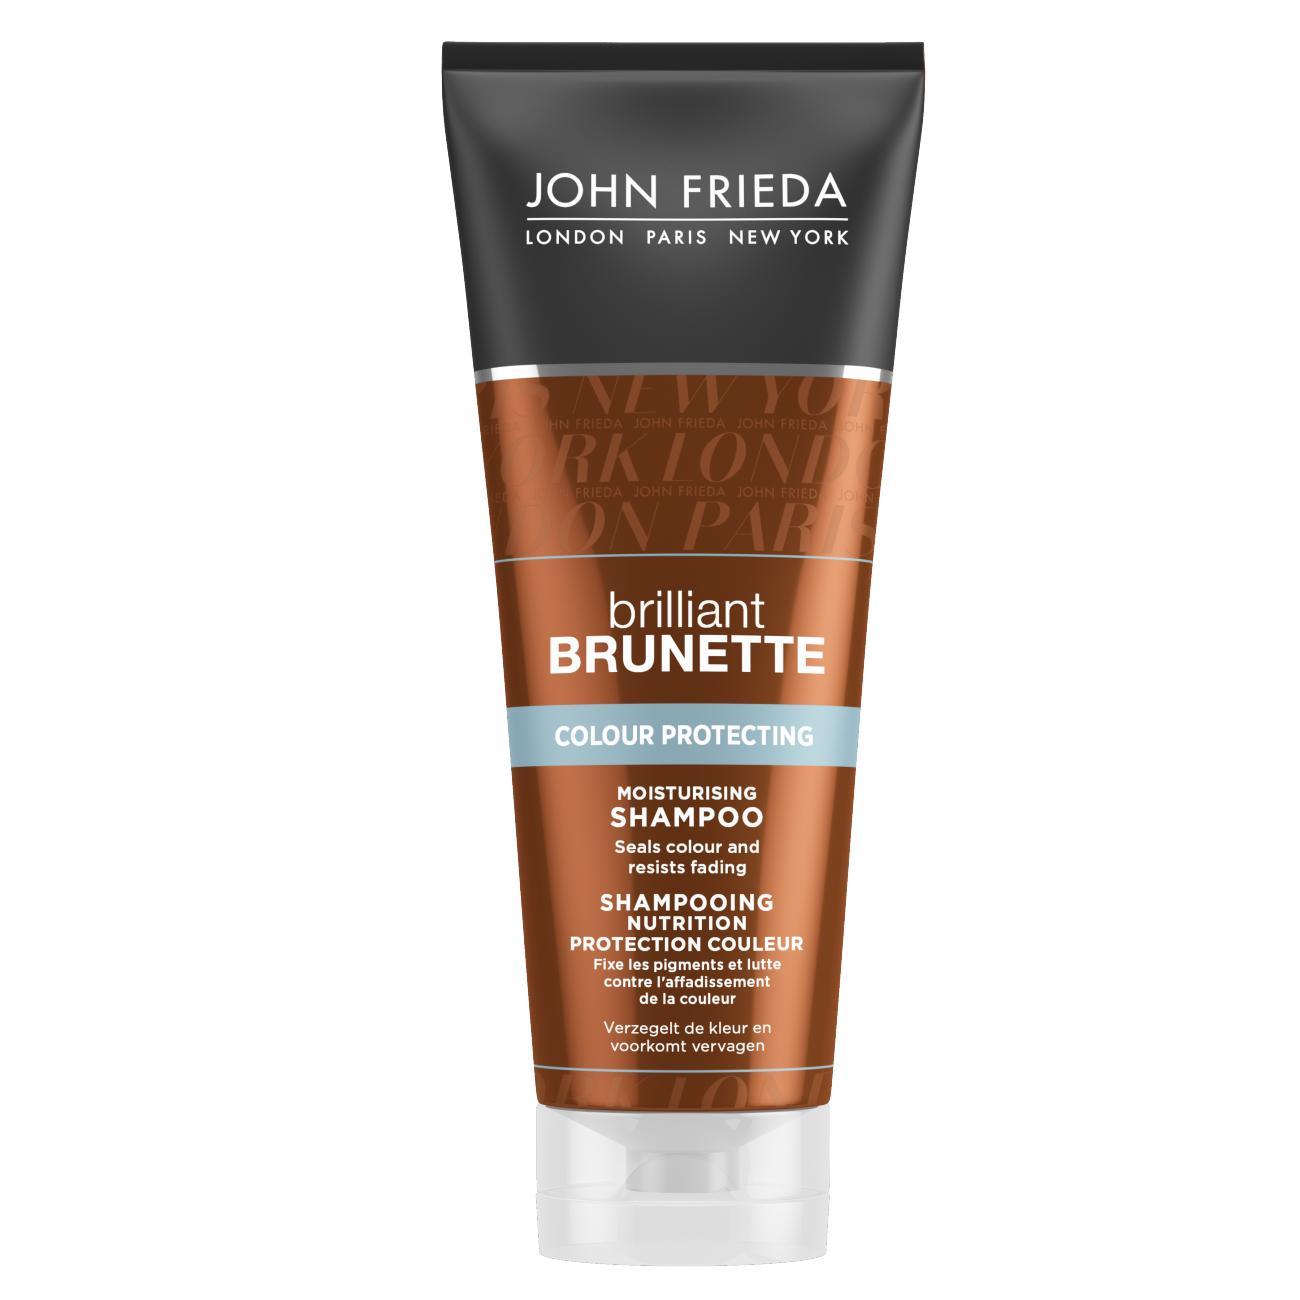 Шампунь John Frieda Brilliant Brunette для защиты цвета темных волос 250 мл<br>